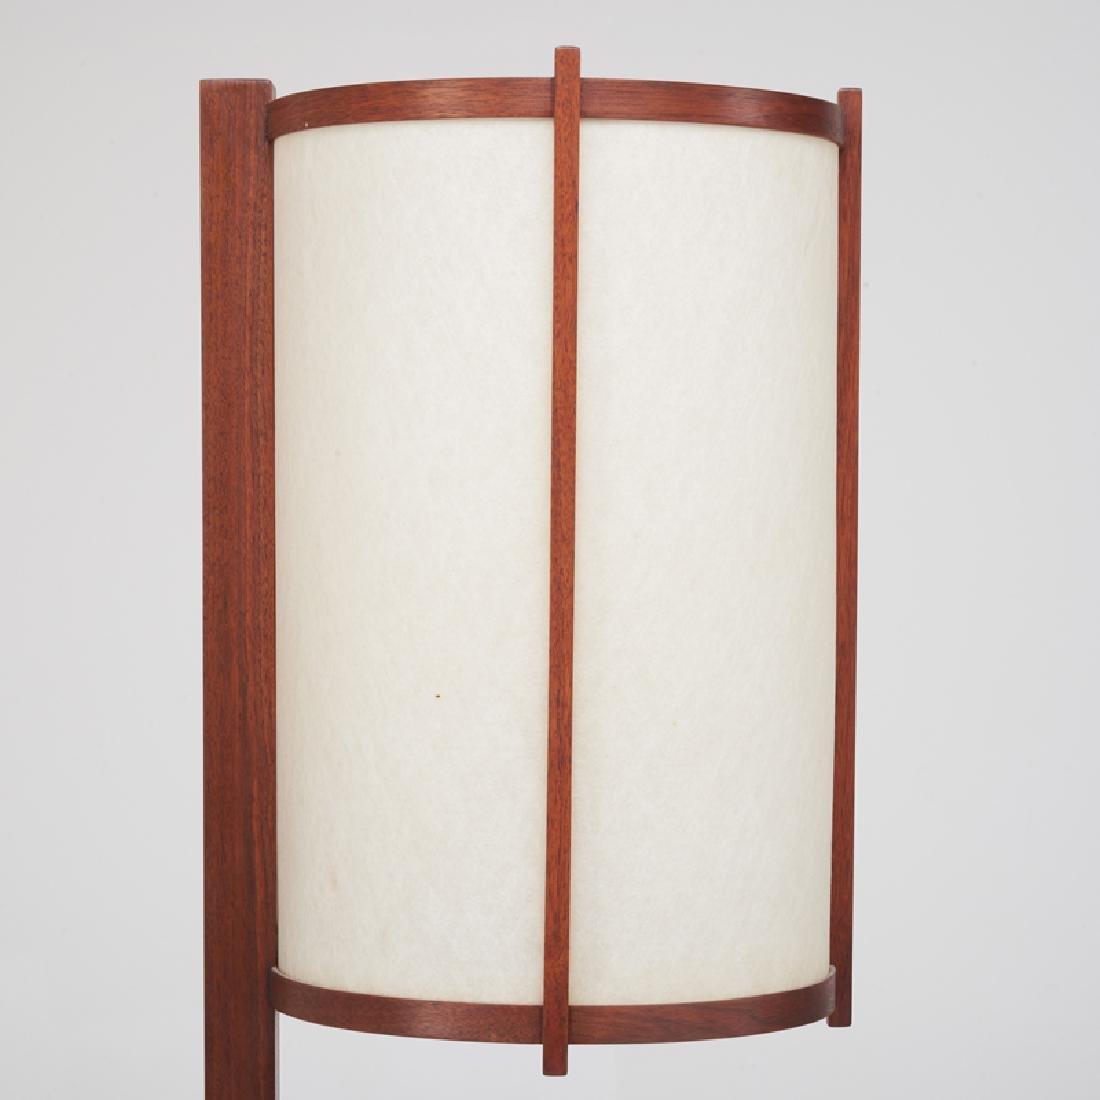 GEORGE NAKASHIMA Floor lamp - 3